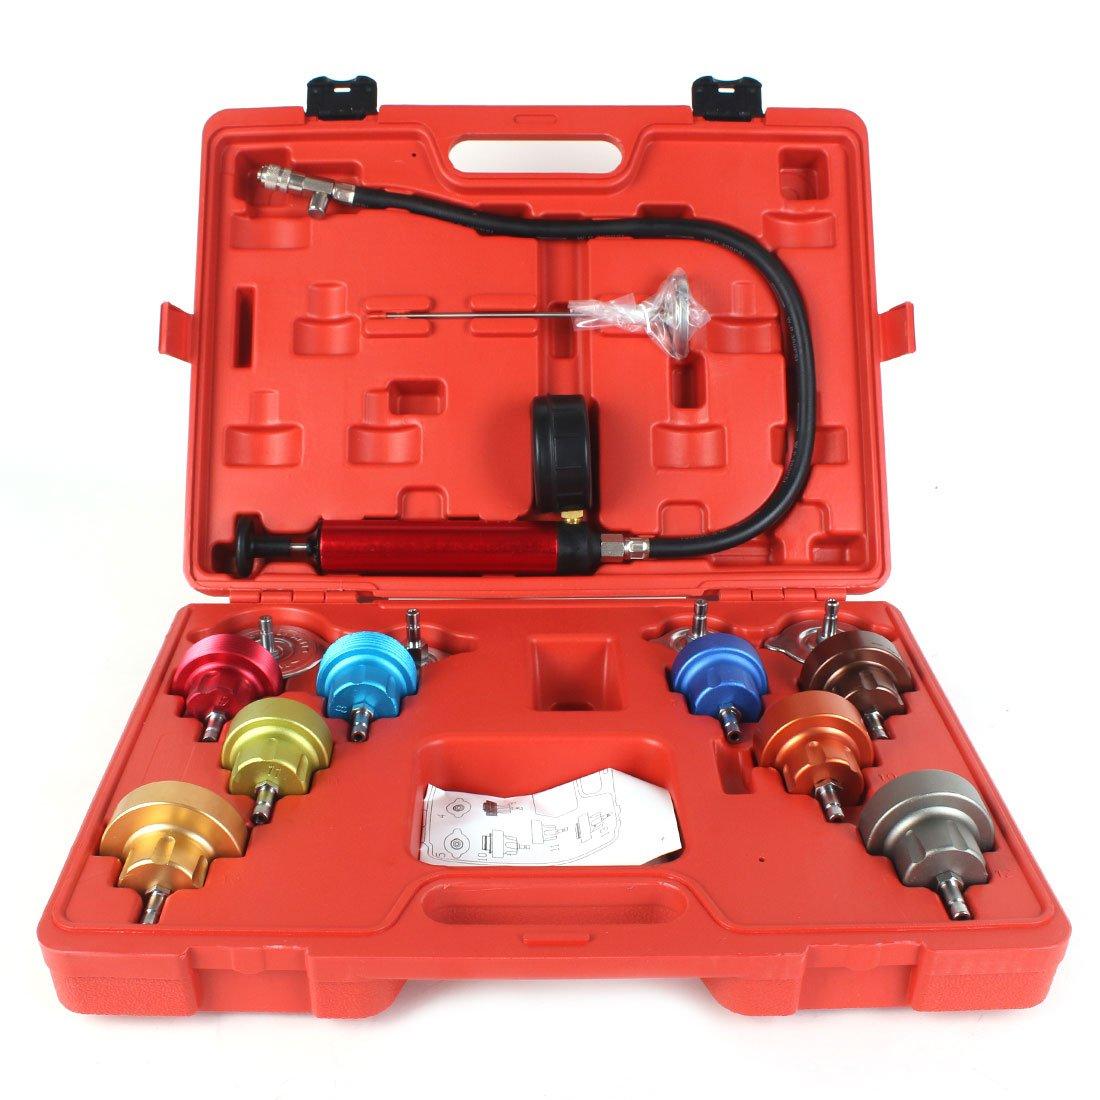 14PCS Cooling System Leak Tester Universal Car Radiator Pressure Kit Test Gauge Set Tools